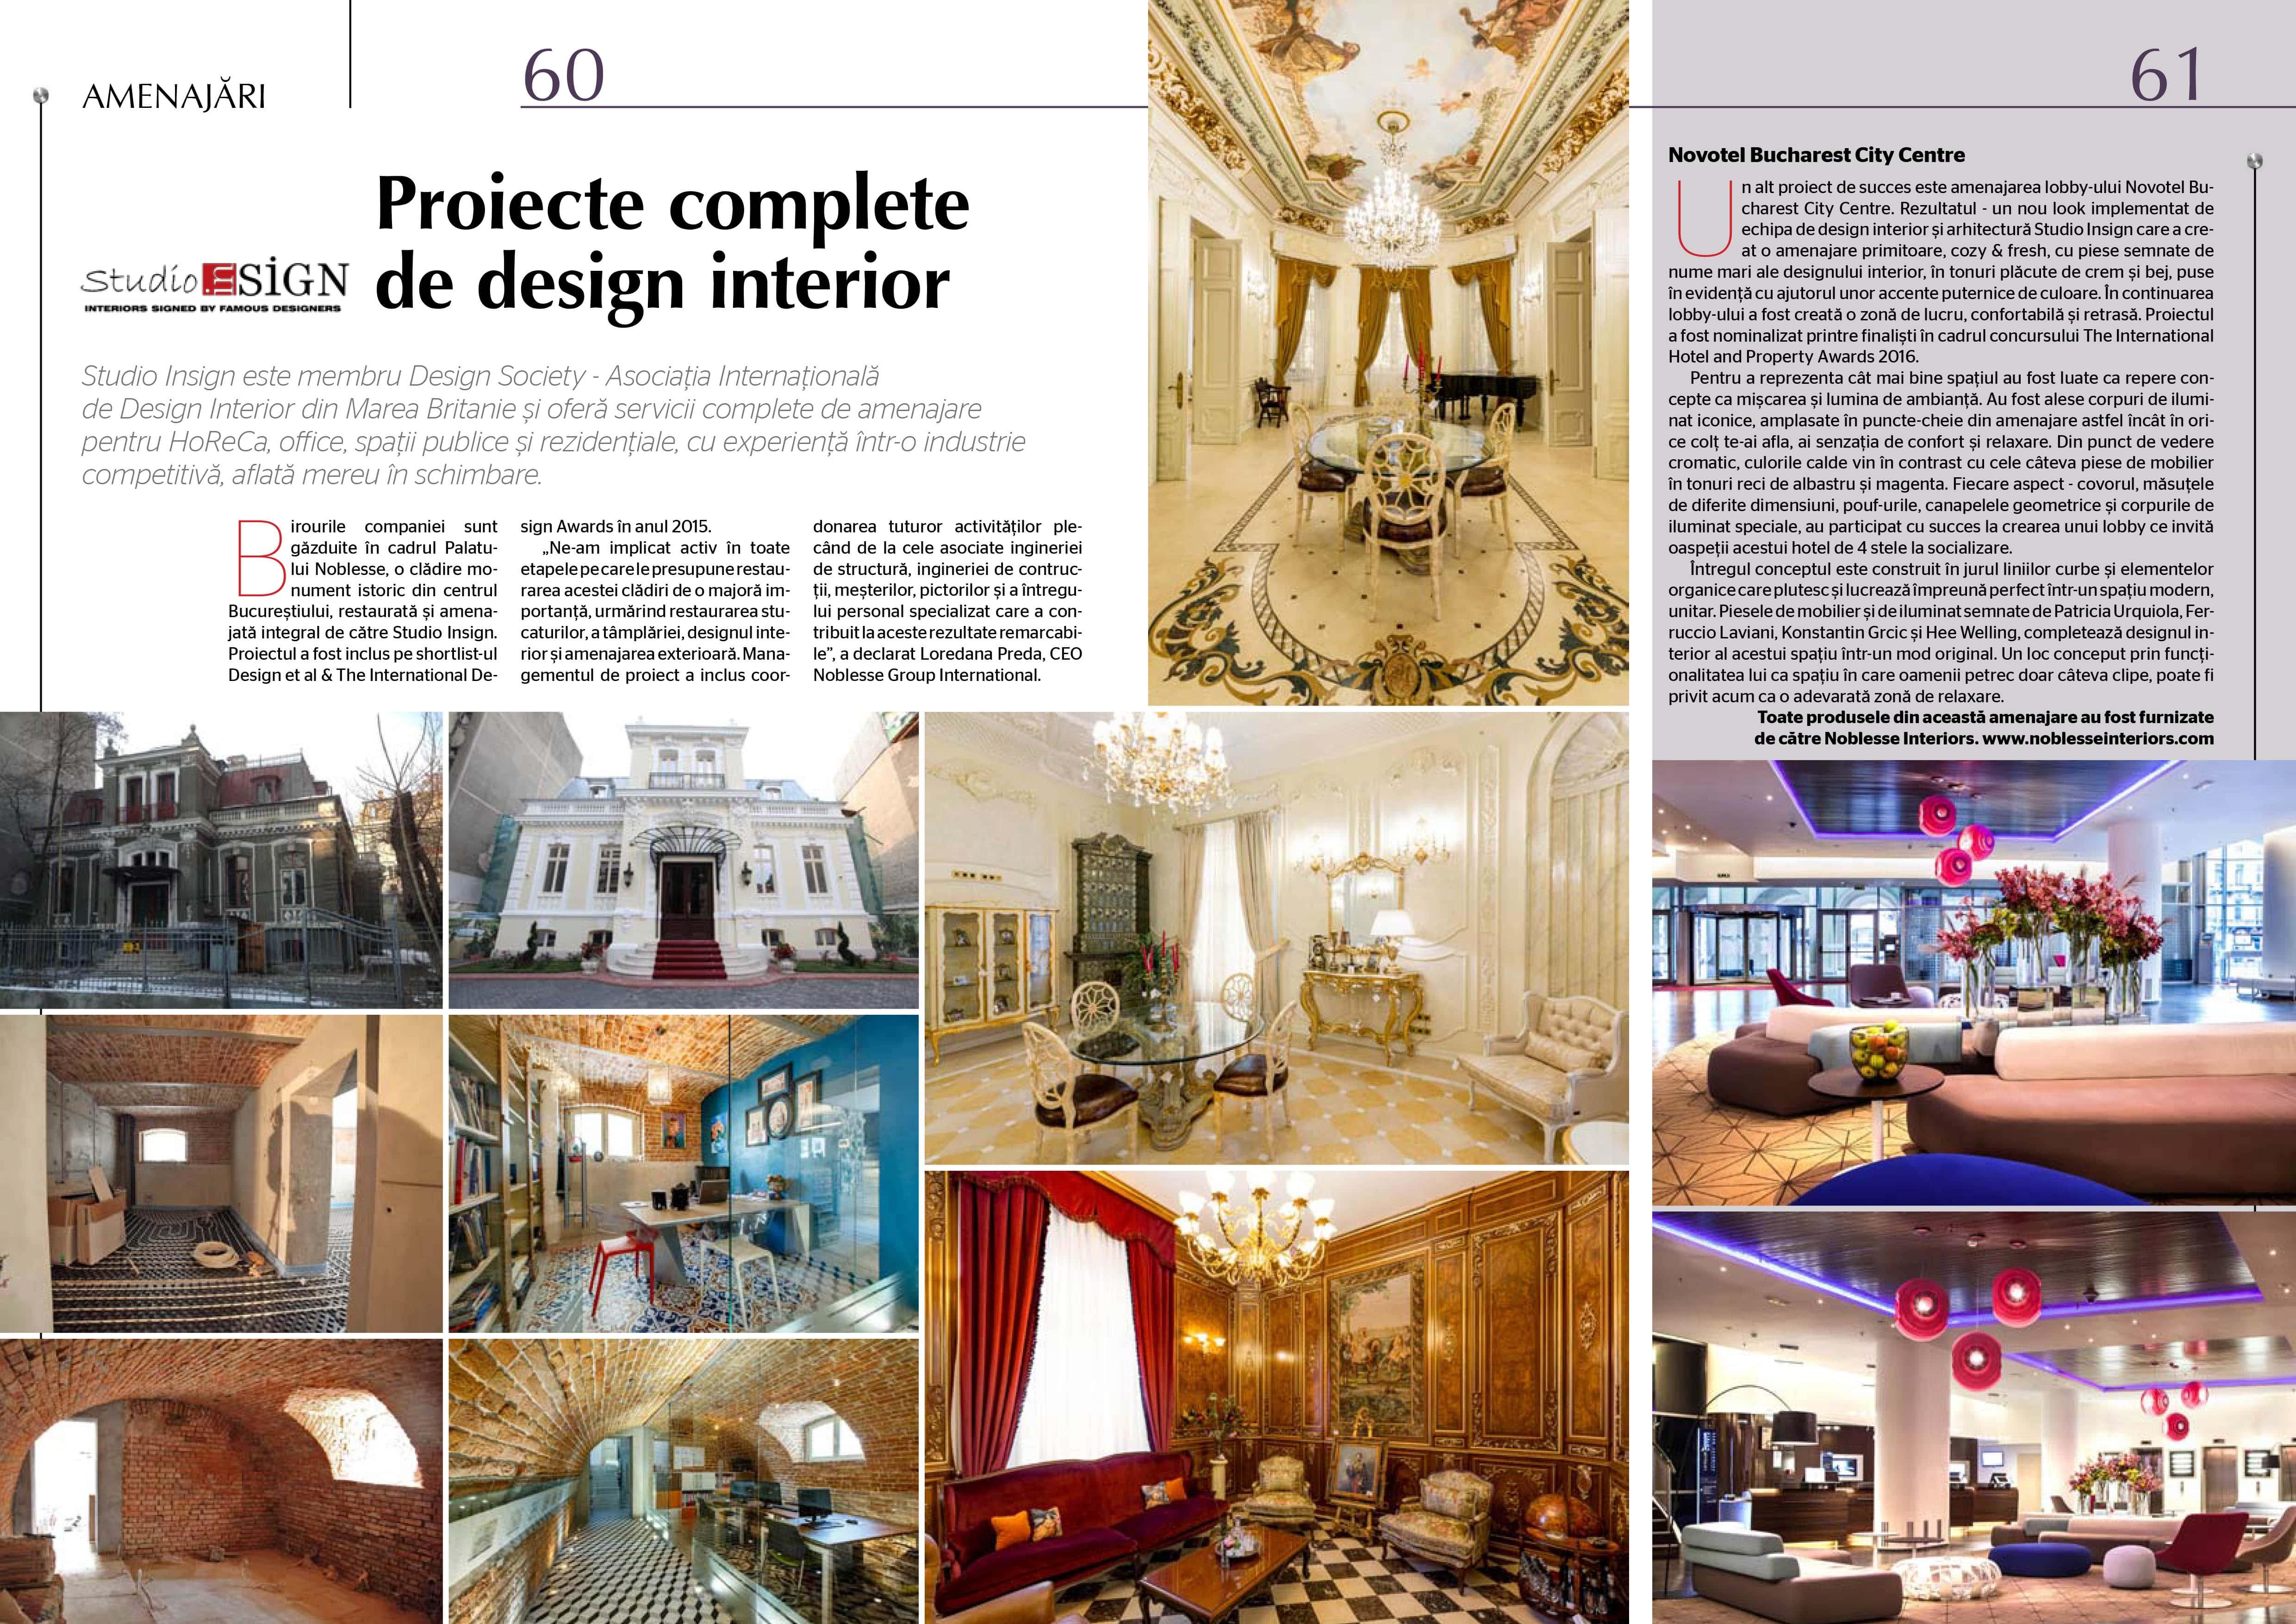 Revista MTC, iulie 2016 - Birourile Studio Insign & Lobby Novotel, proiecte amenajate integral de echipa de design interior si arhitectura